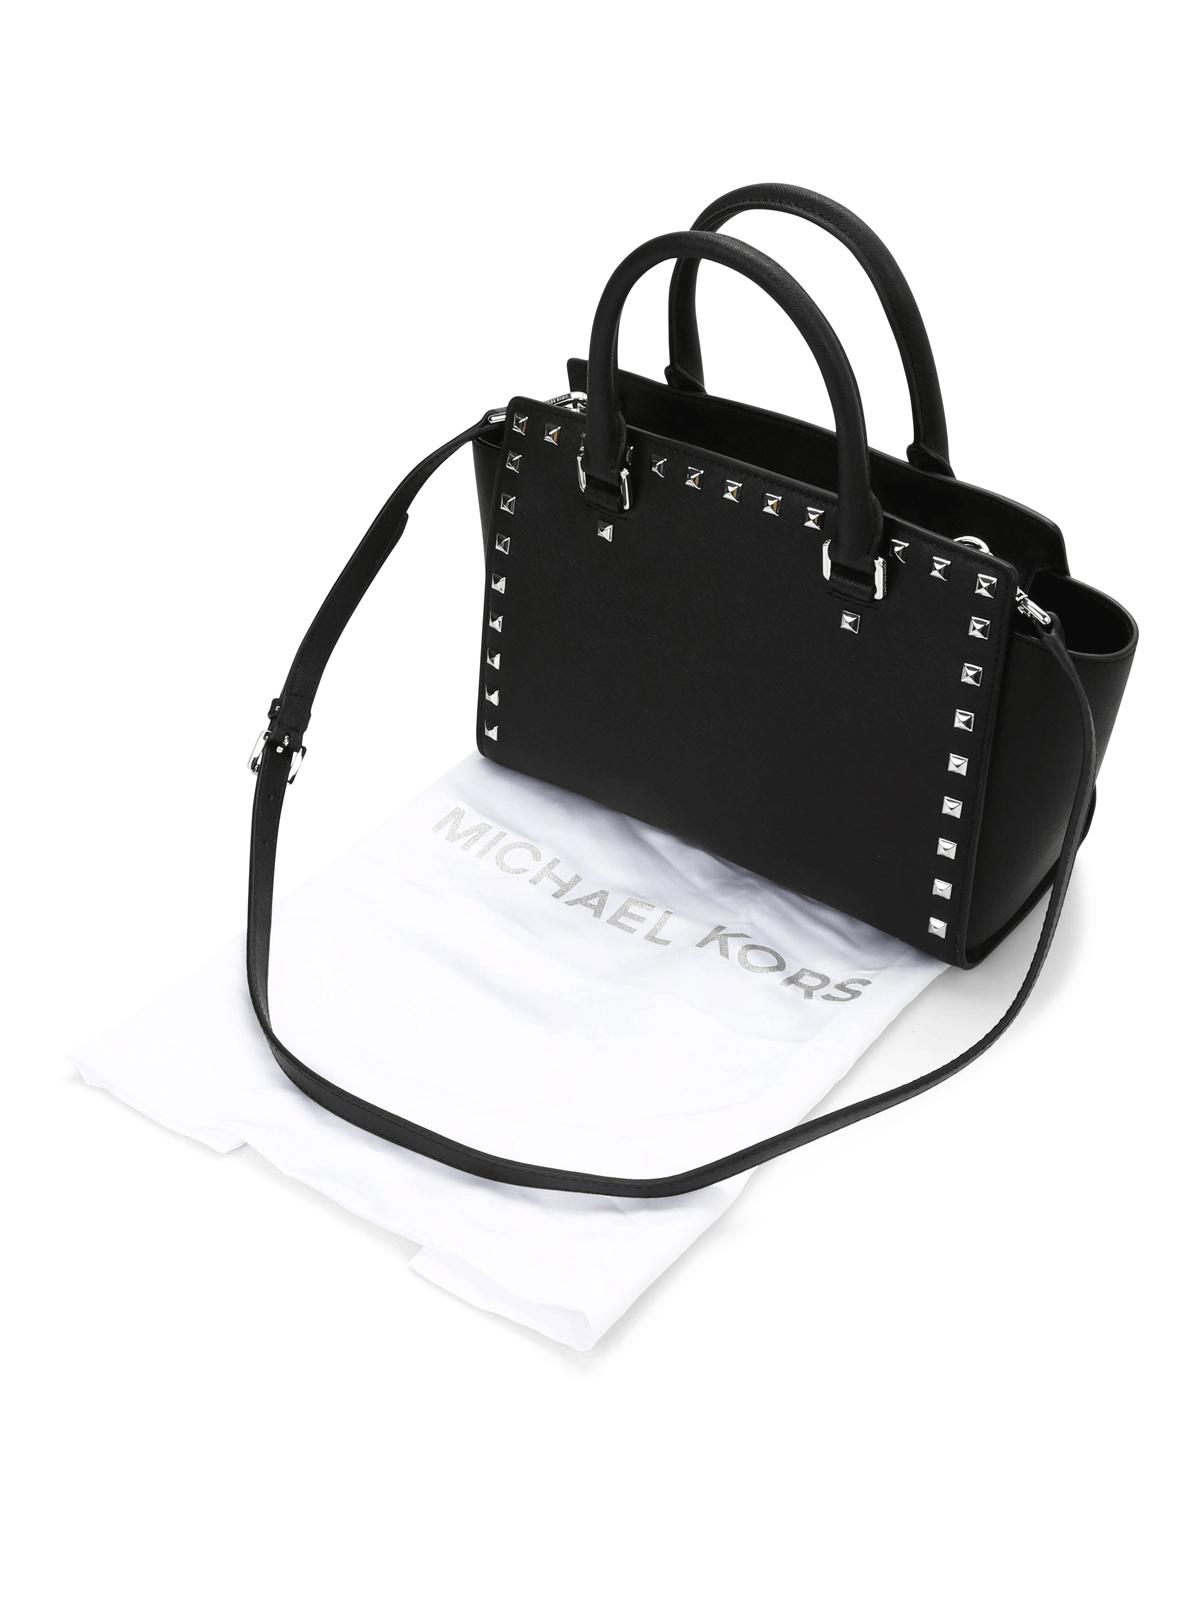 a1bda821e9 Michael Kors - Selma medium studded tote - totes bags - 30T3SSMS2L 001